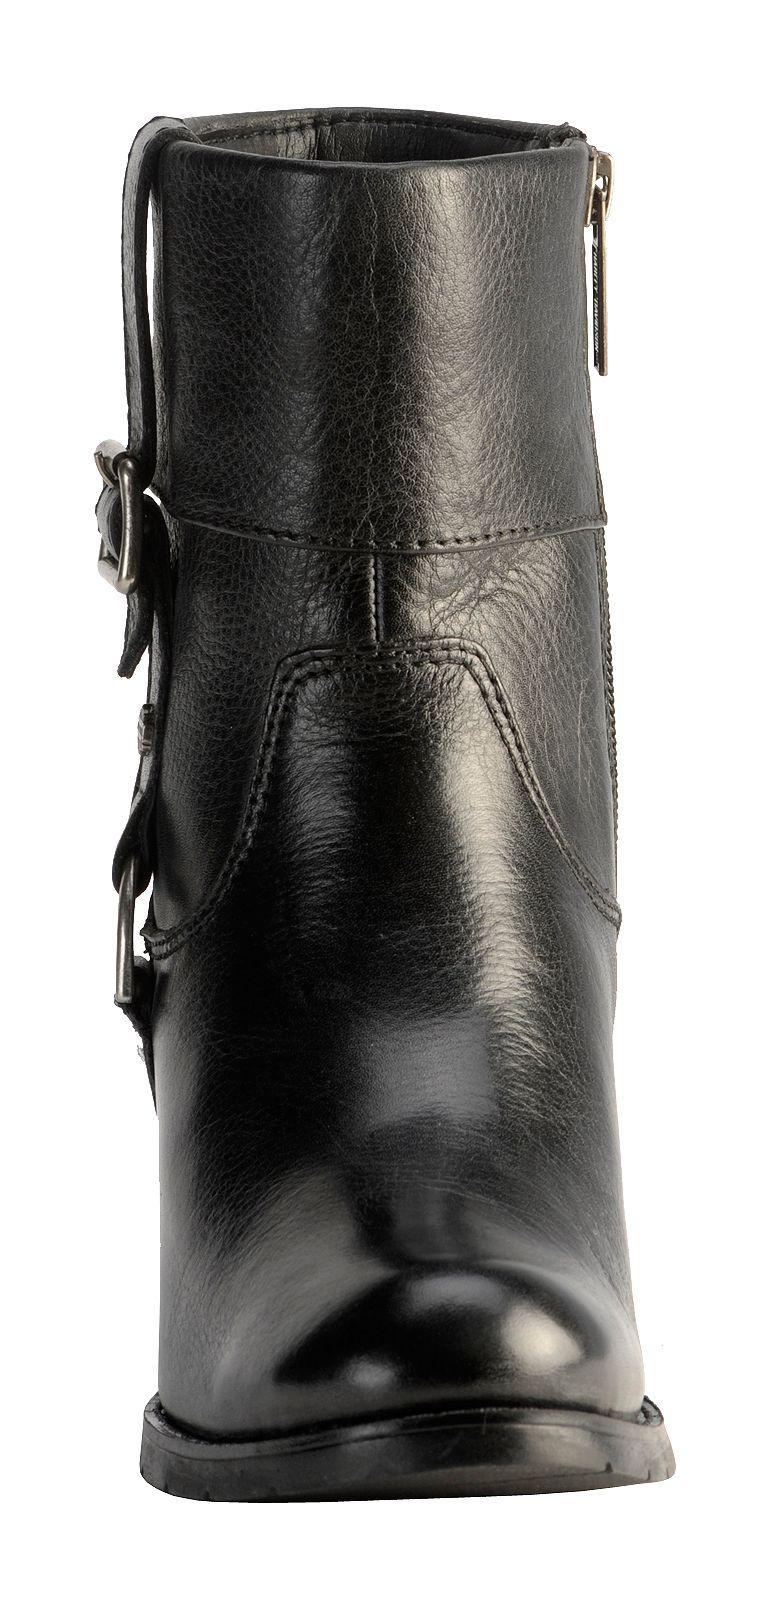 6de31f415917 Harley Davidson Sadie Women s Boots - Round Toe